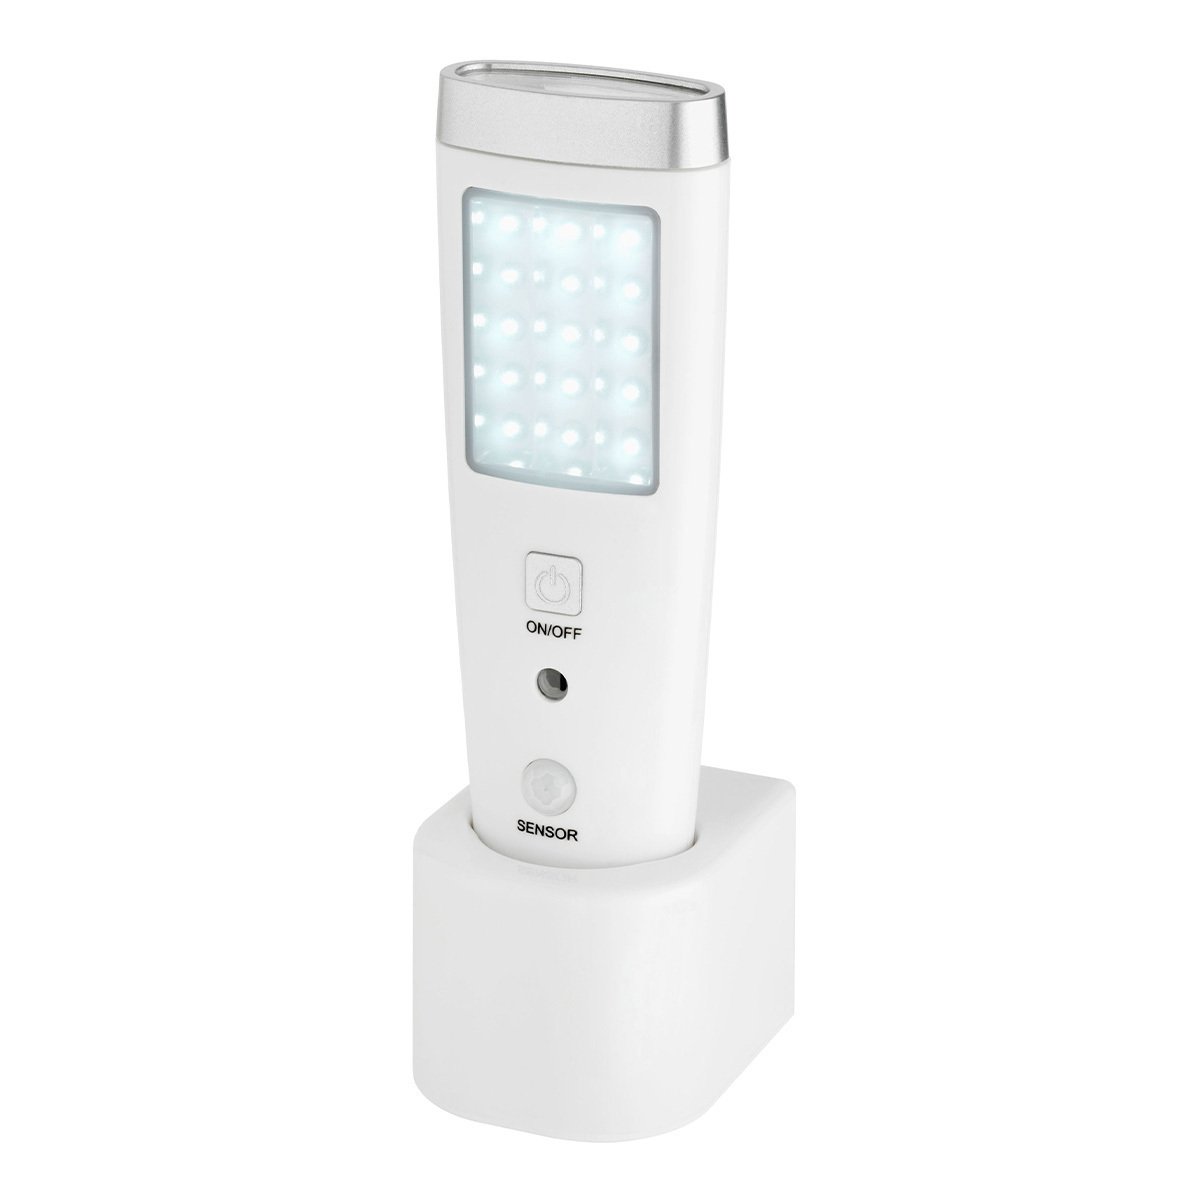 43-2033-led-multi-funktions-sicherheitslampe-lumatic-guard-1200x1200px.jpg